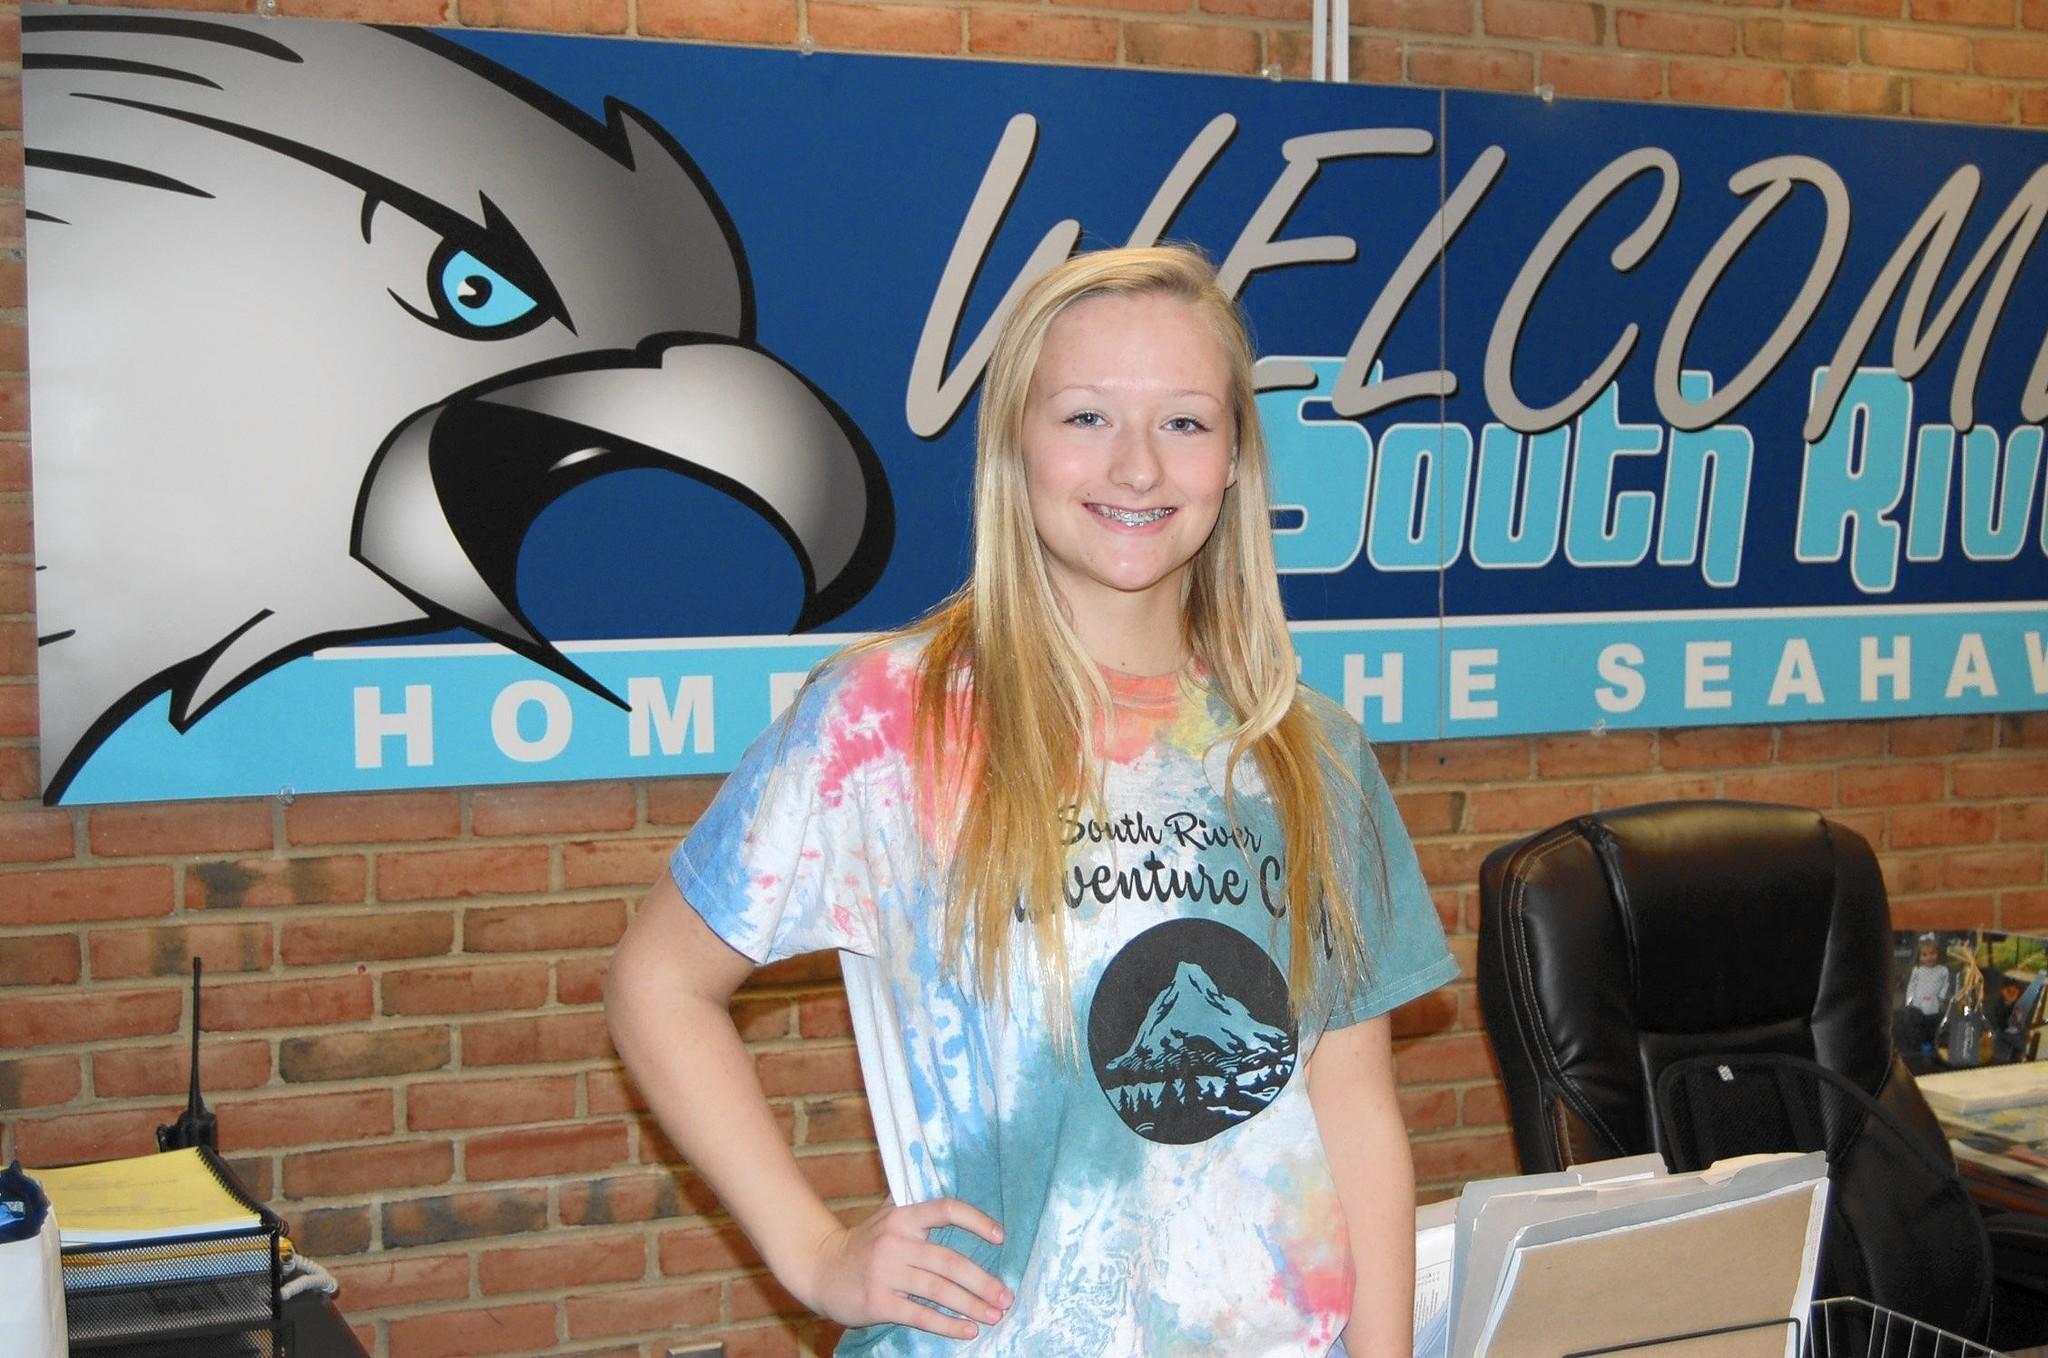 Teen Of The Week South River Teen Tears Up Raceways